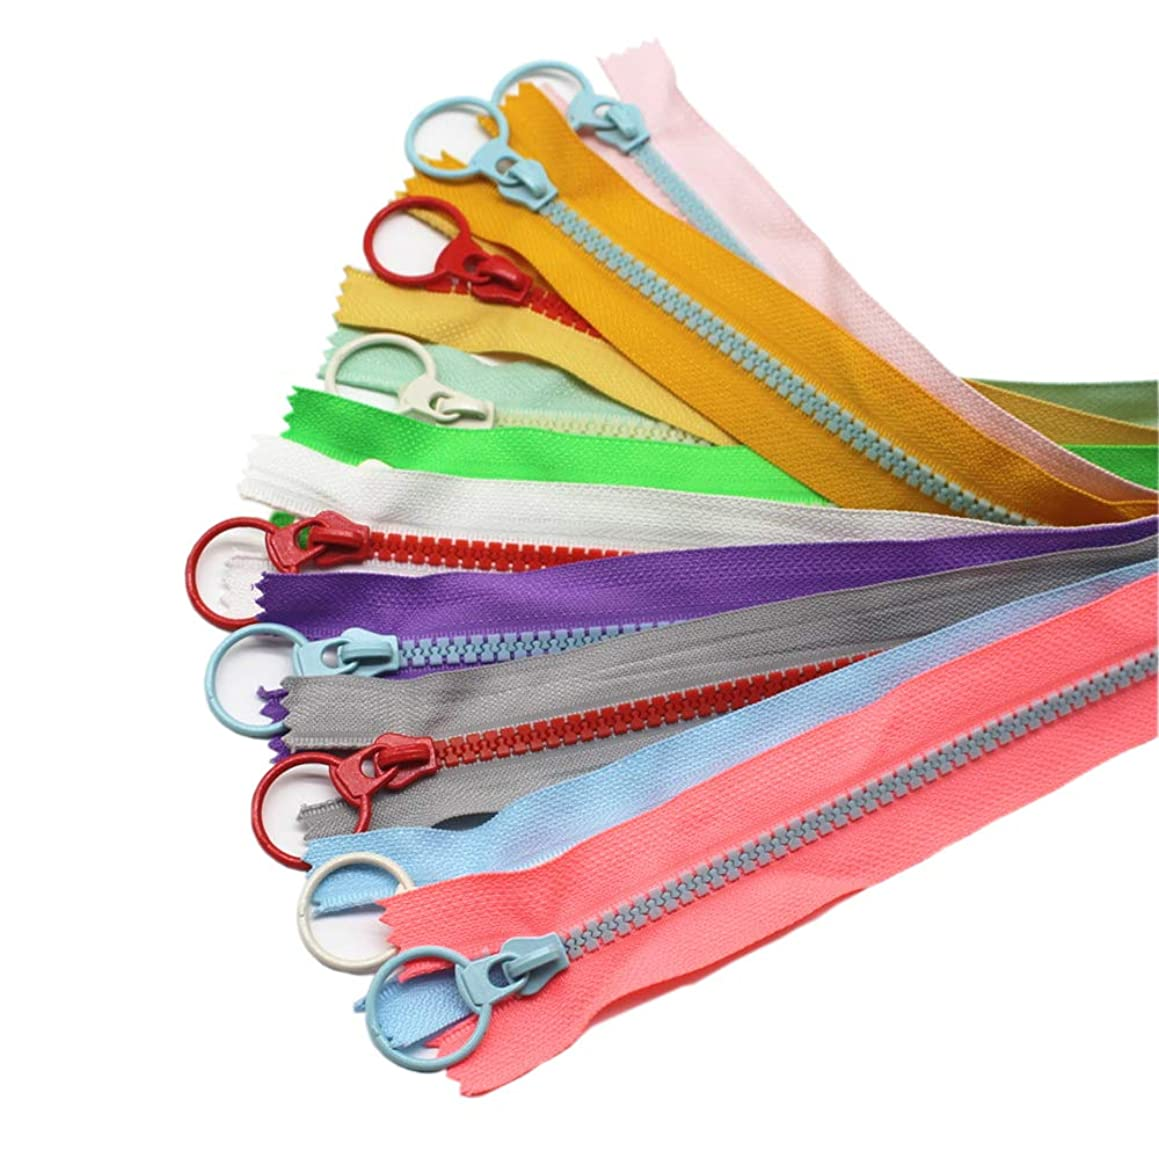 YaHoGa 20PCS 12 Inch (30CM) 5# Plastic Zippers Close End Resin Zippers Vislon Zippers for DIY Sewing Craft Bags Garment (12